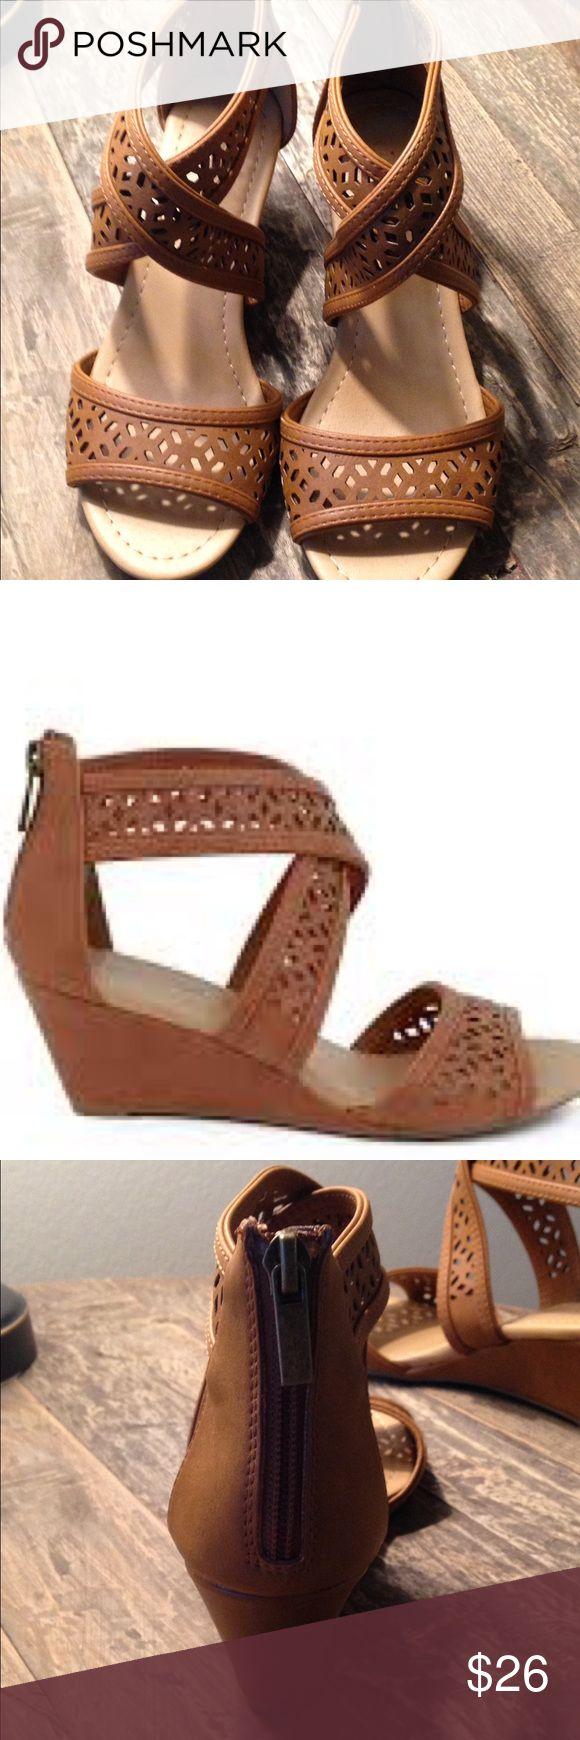 Black sandals littlewoods - New Love Wedge Boho Sandals